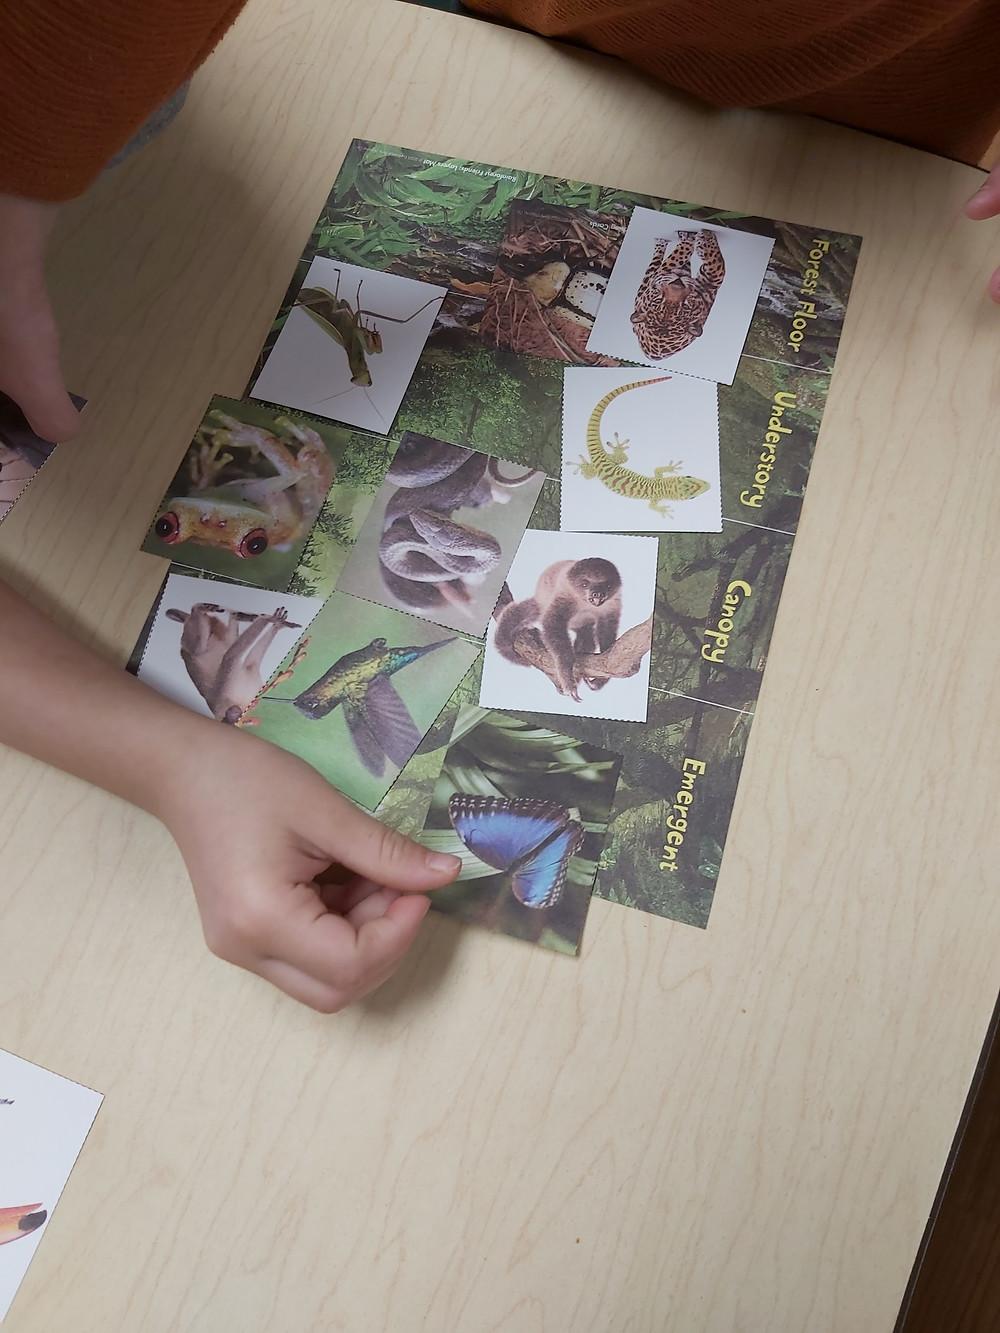 preschooler placing butterfly card on rainforest layers gameboard